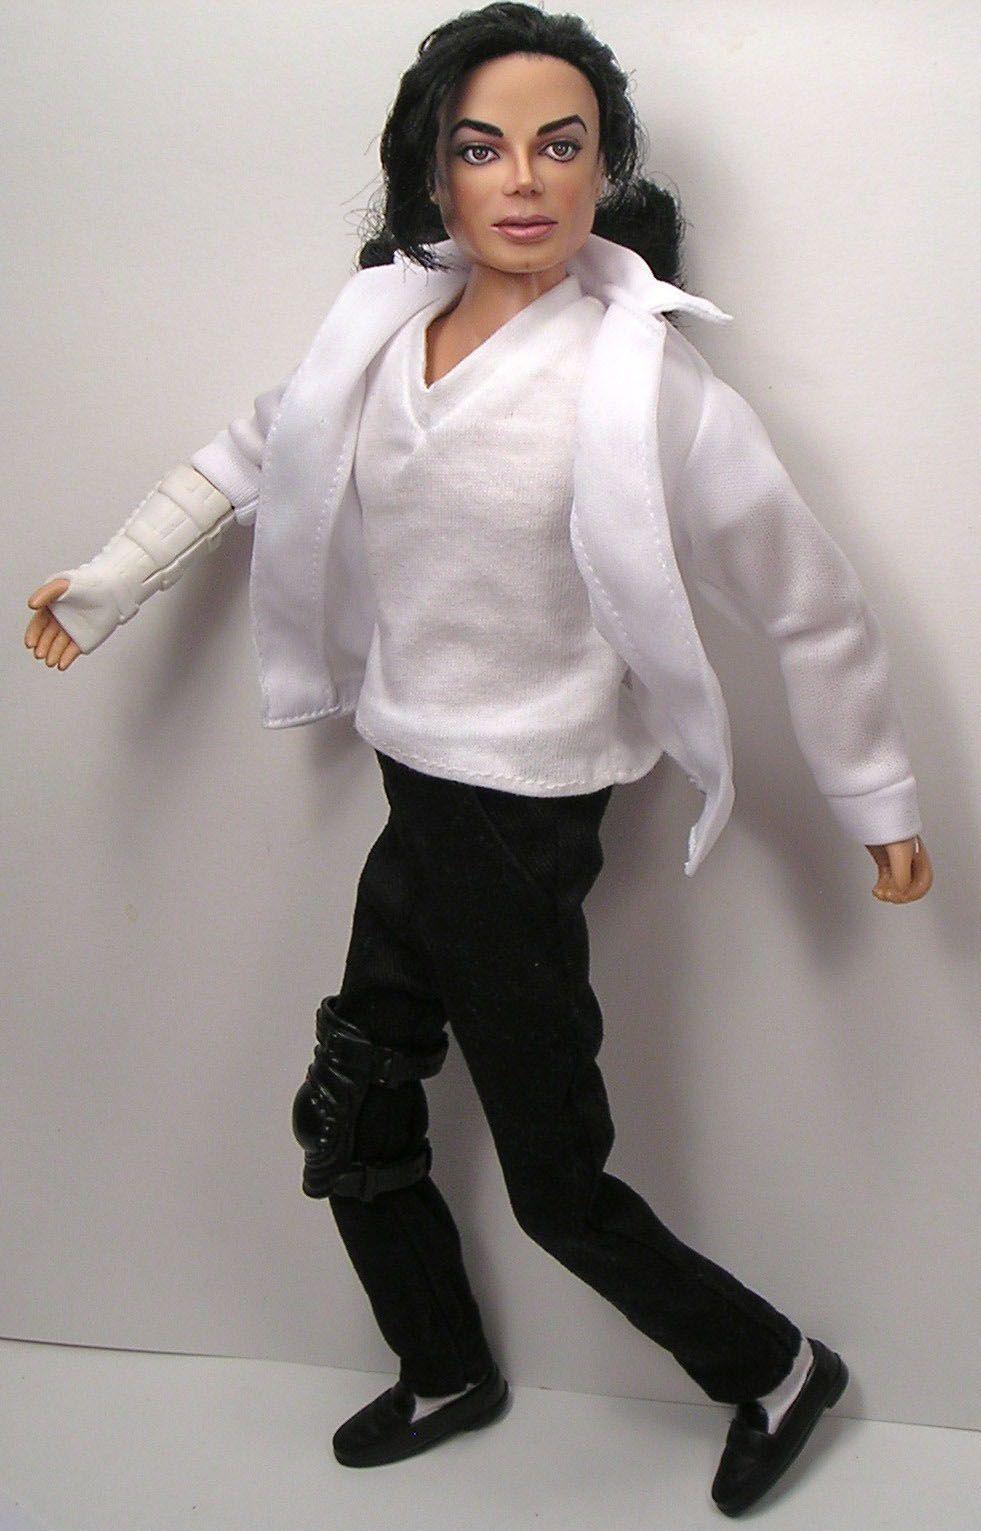 Photo of OOAK ~MICHAEL JACKSON~ Tribute Doll Art Repaint By Artist Pamela Reasor